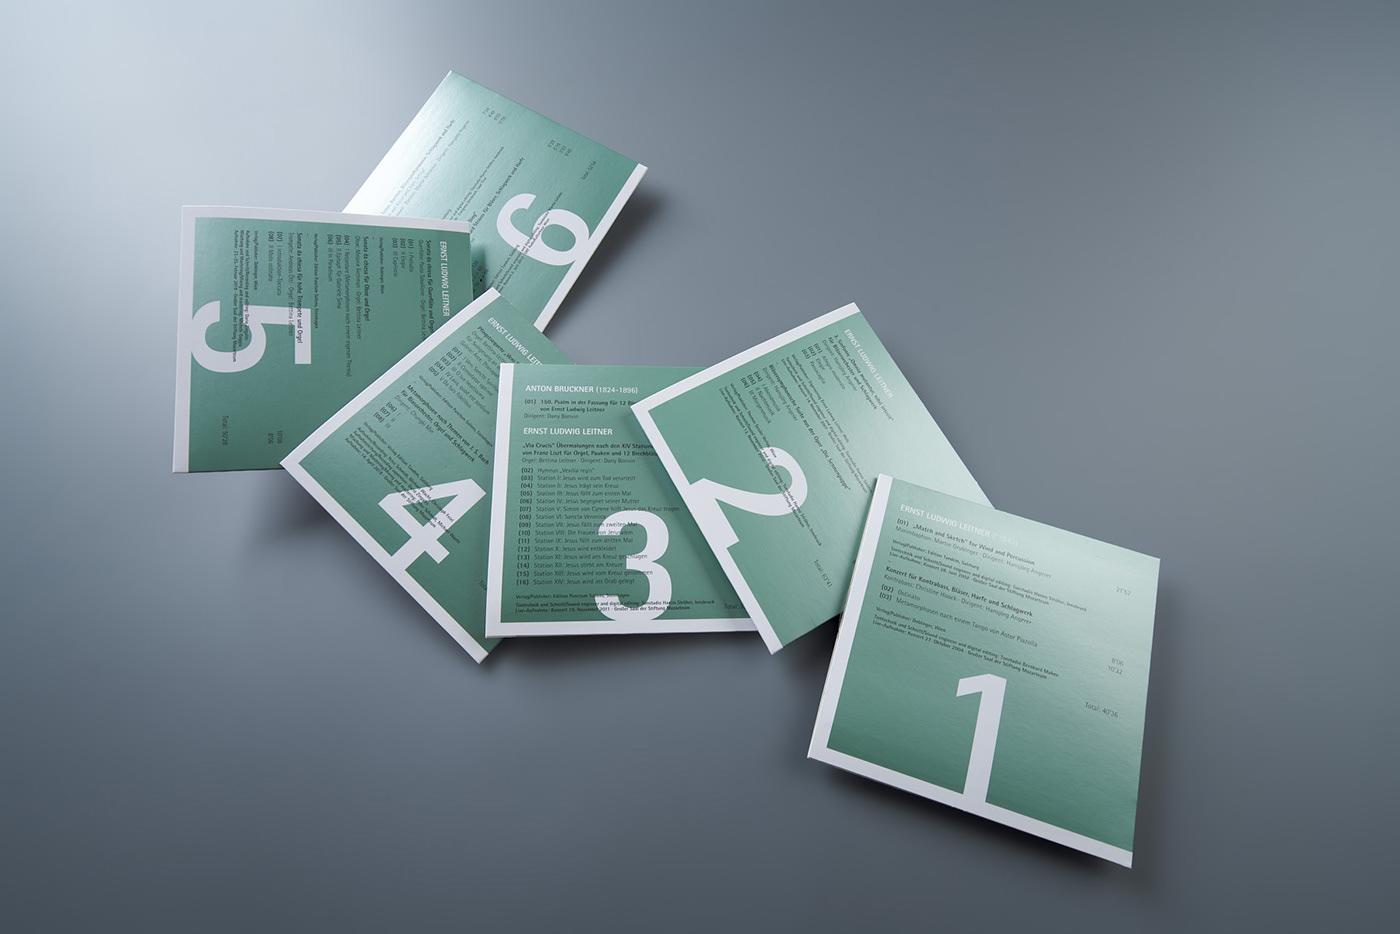 wirsindartisten albumcover coverdesign graphicdesign Recordcover